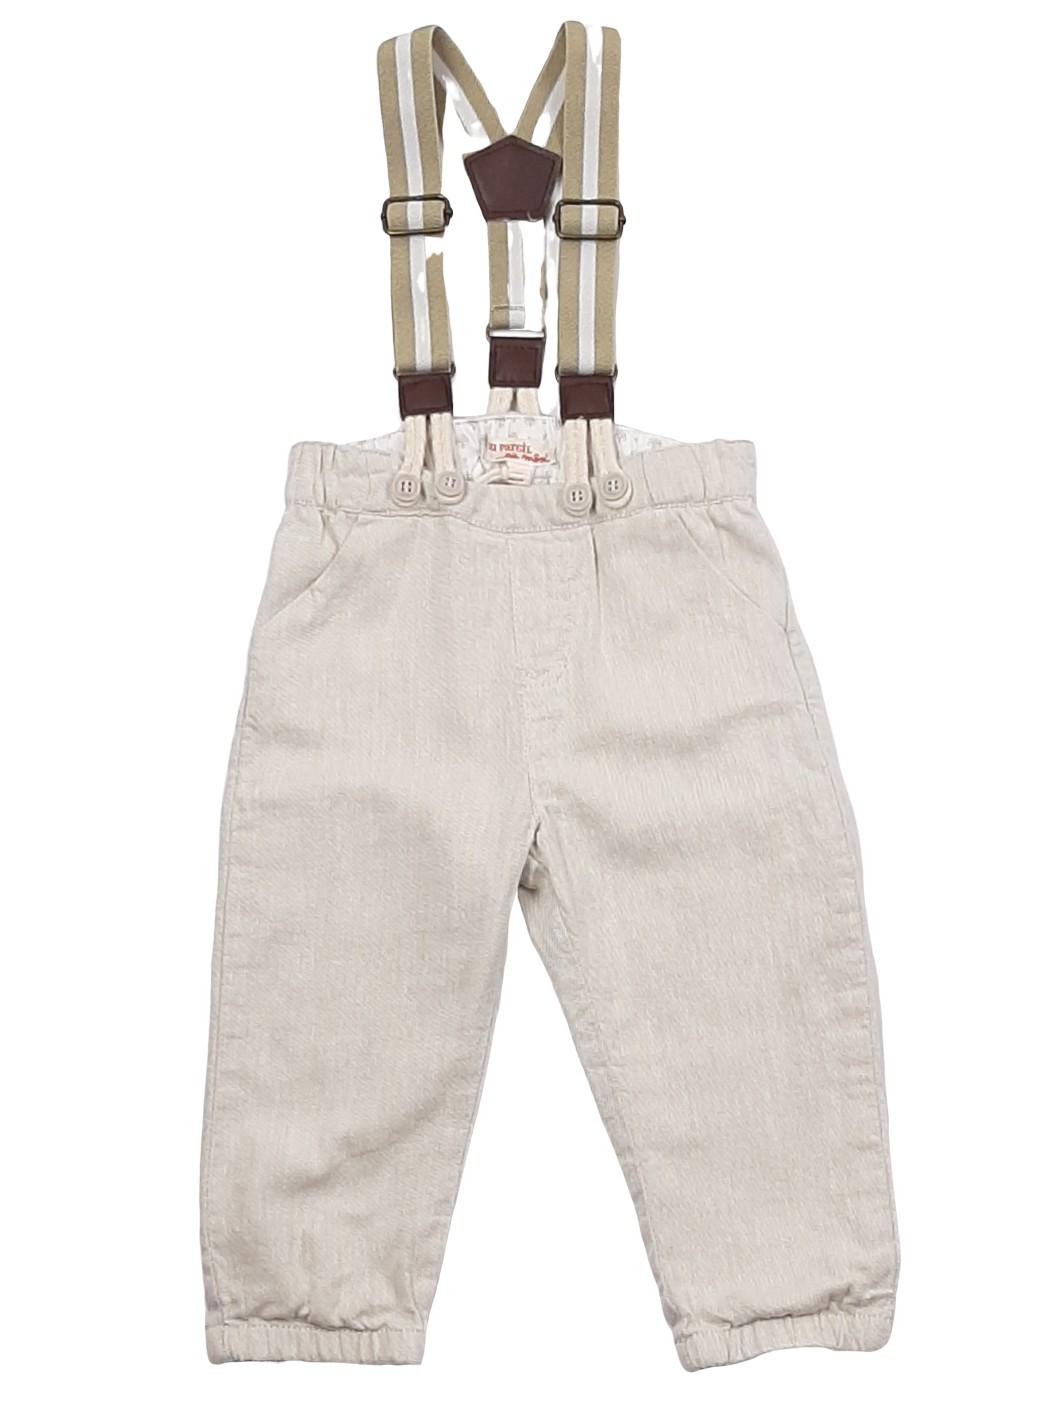 Pantalon fin avec bretelles amovibles 1